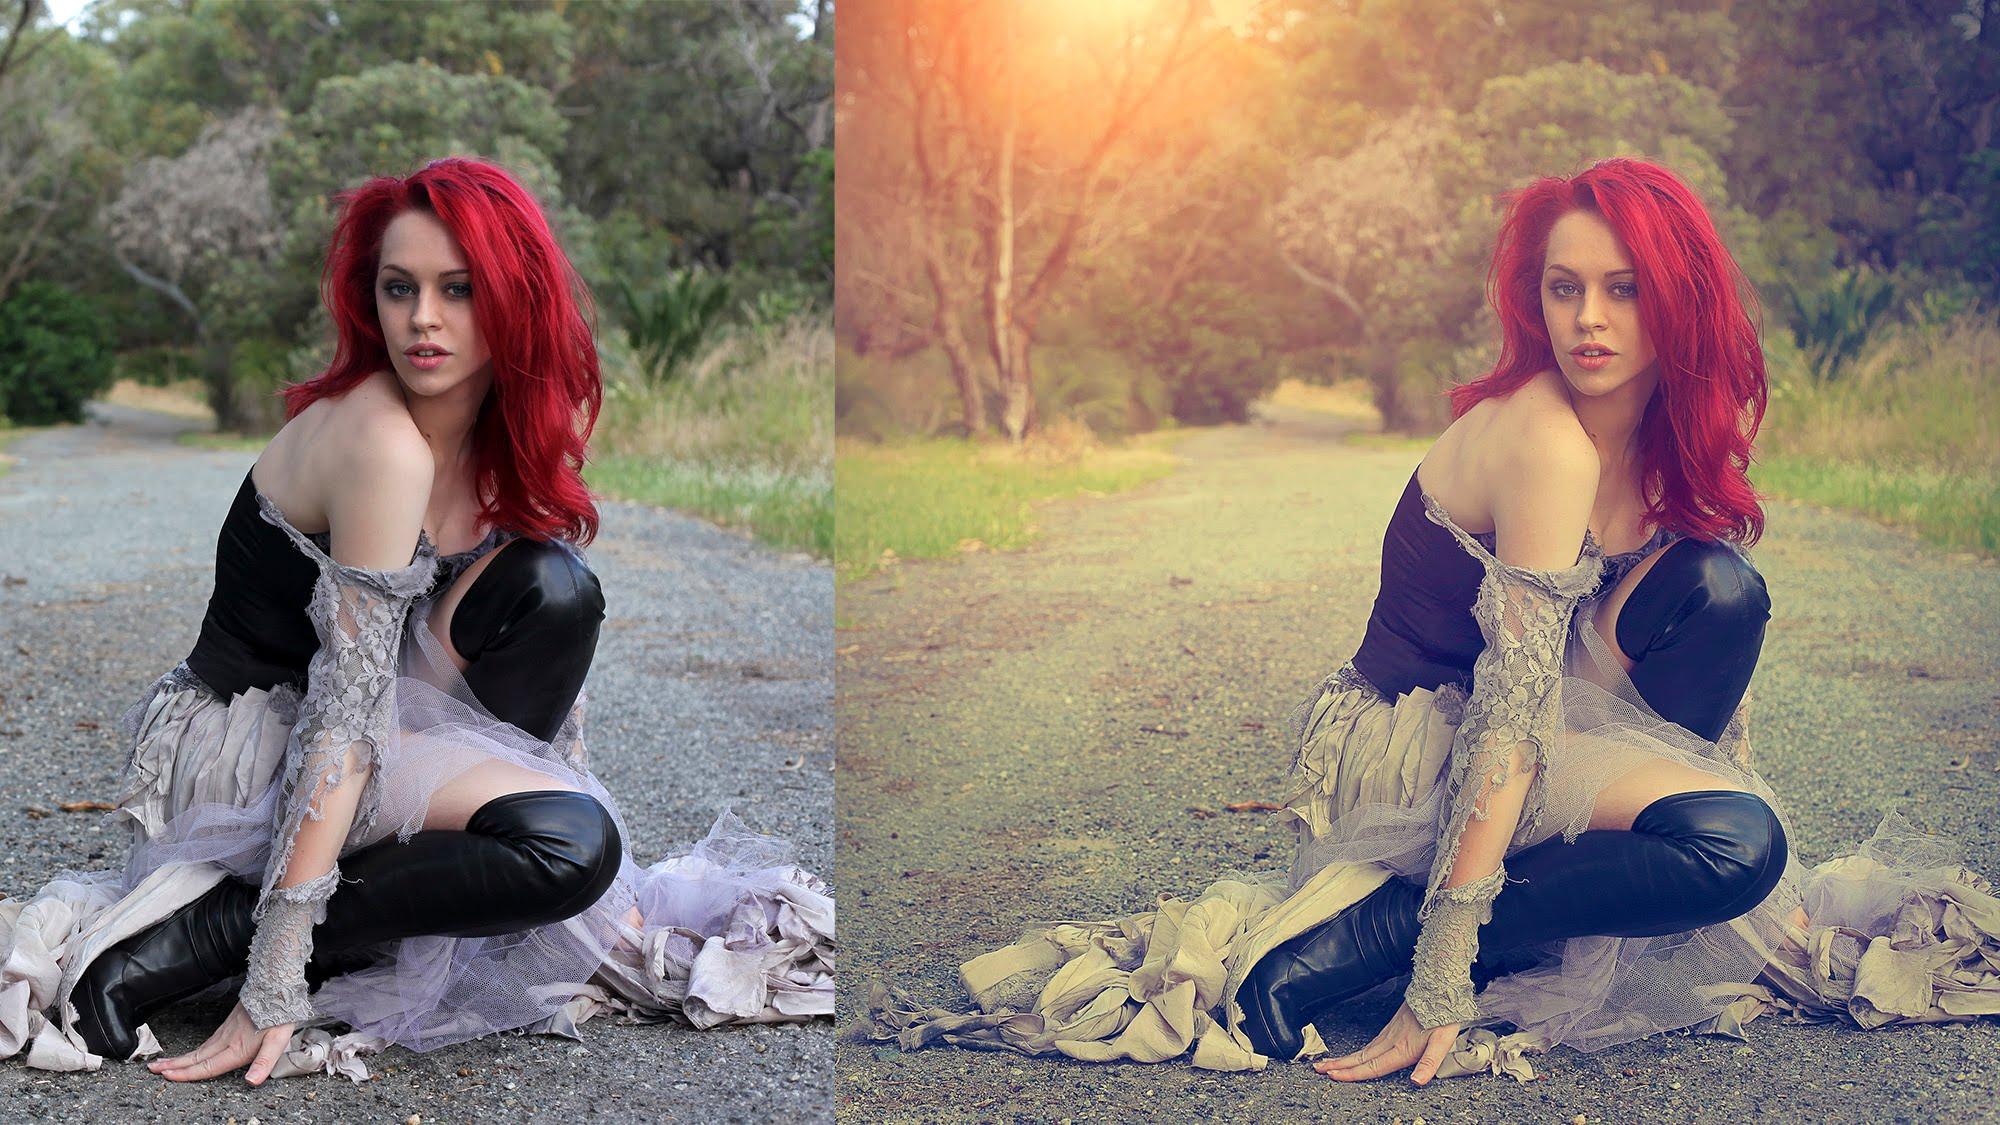 vintage soft light effect | photoshop tutorial cs6 | ADOBE